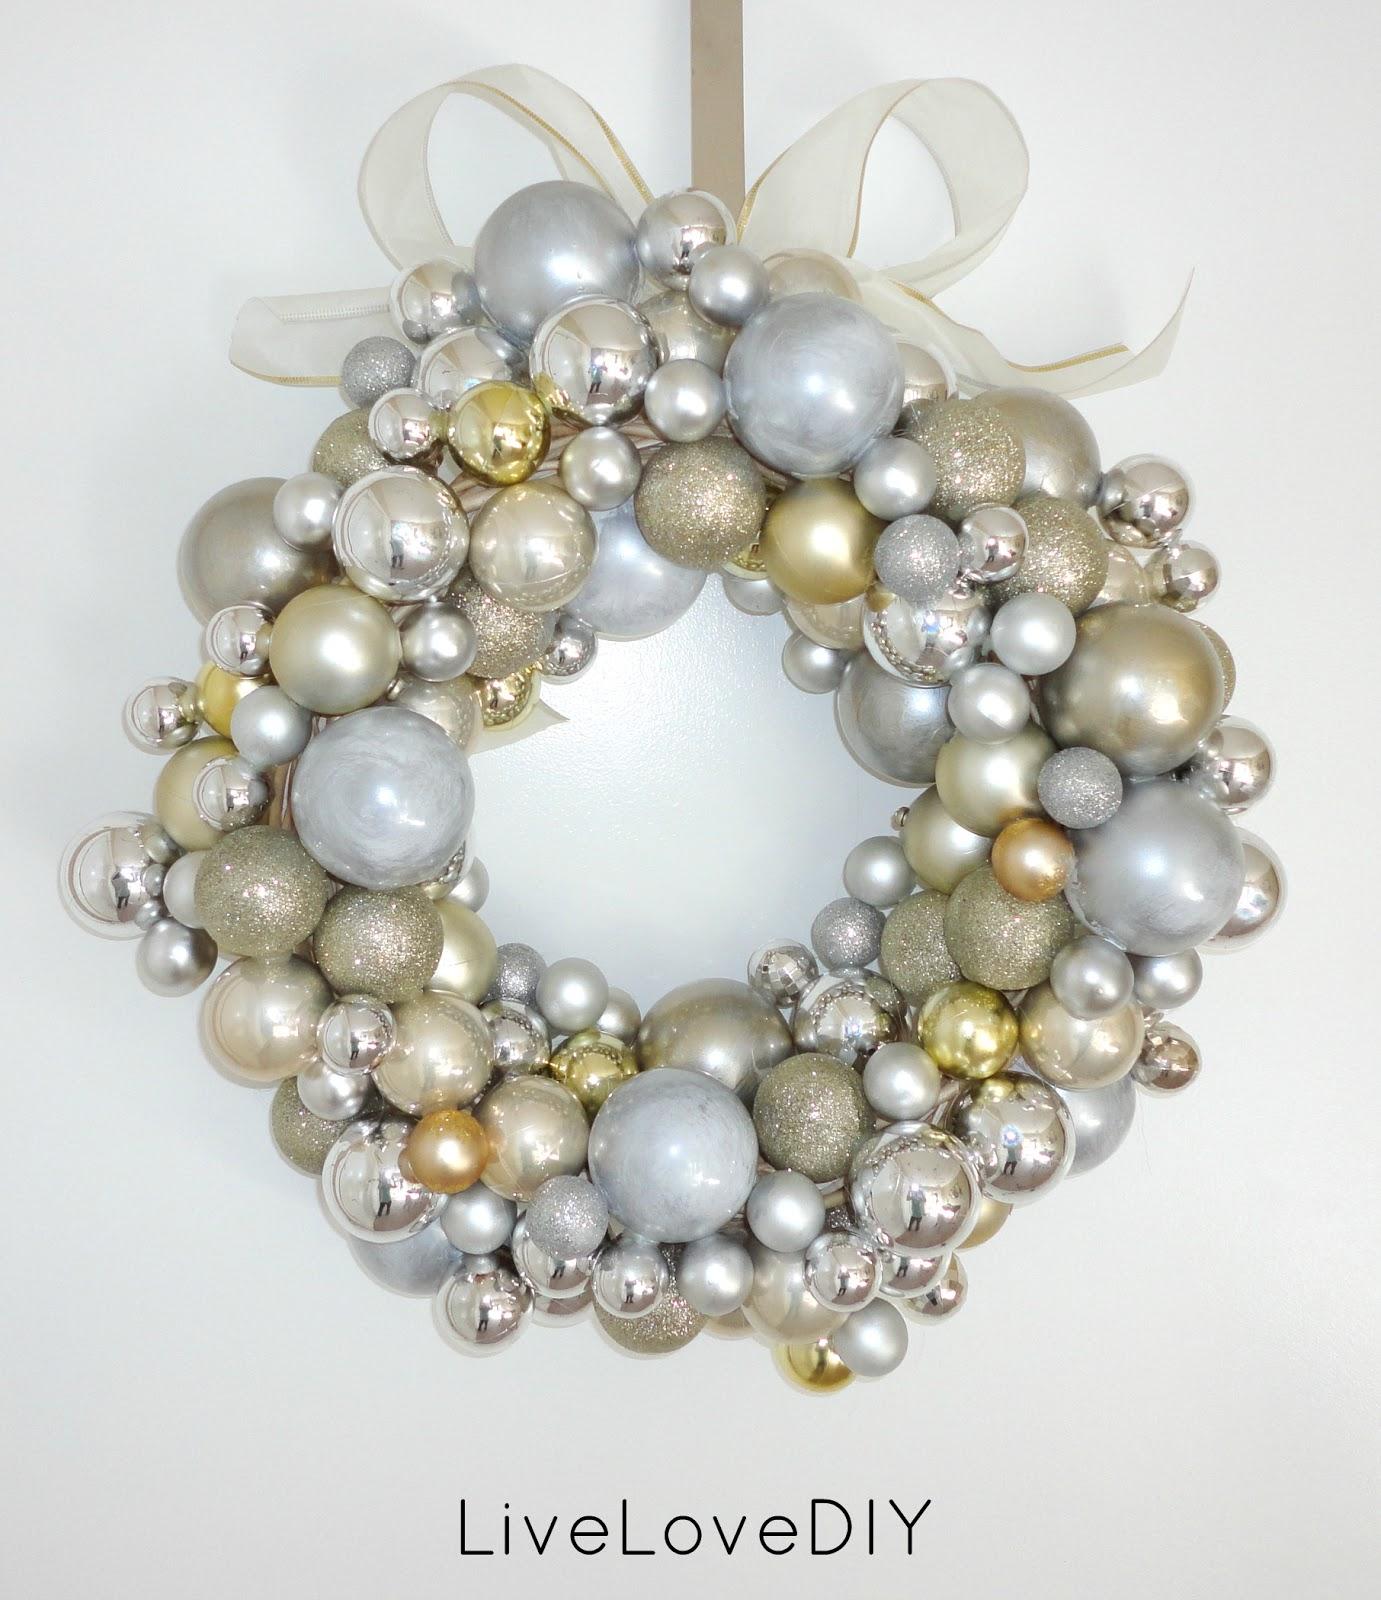 diy inspiration christmas ornament balls - How To Make My Own Christmas Decorations